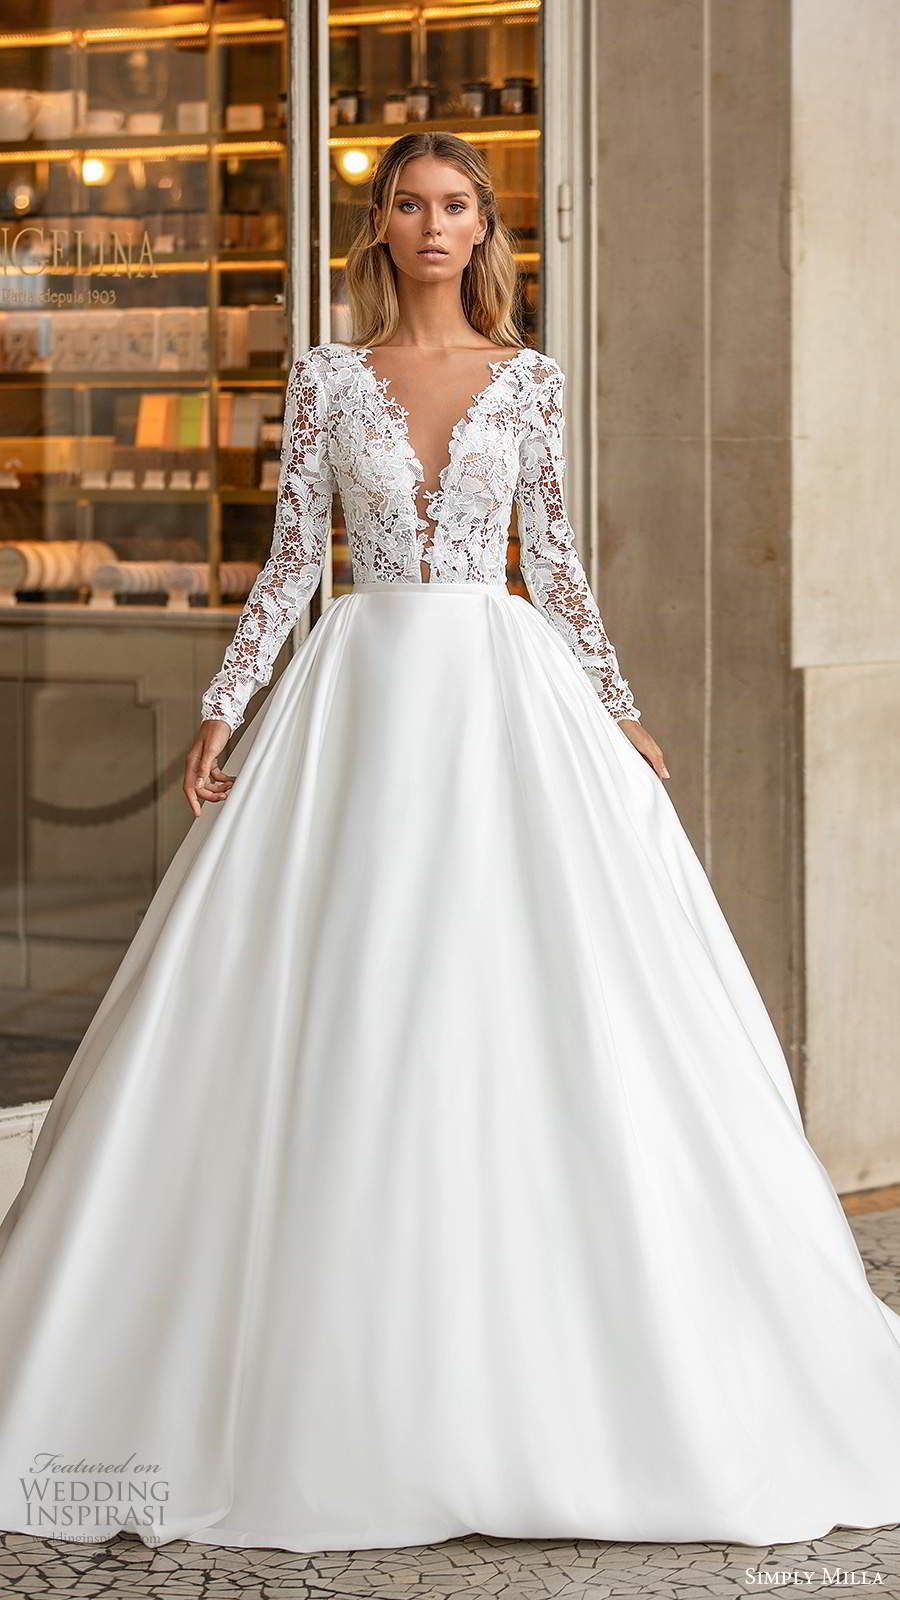 Milla Nova S Simply Milla 2020 Wedding Dresses Wedding Inspirasi Milla Nova Wedding Dresses Long Sleeve Satin Wedding Dress Ball Gowns Wedding [ 1600 x 900 Pixel ]